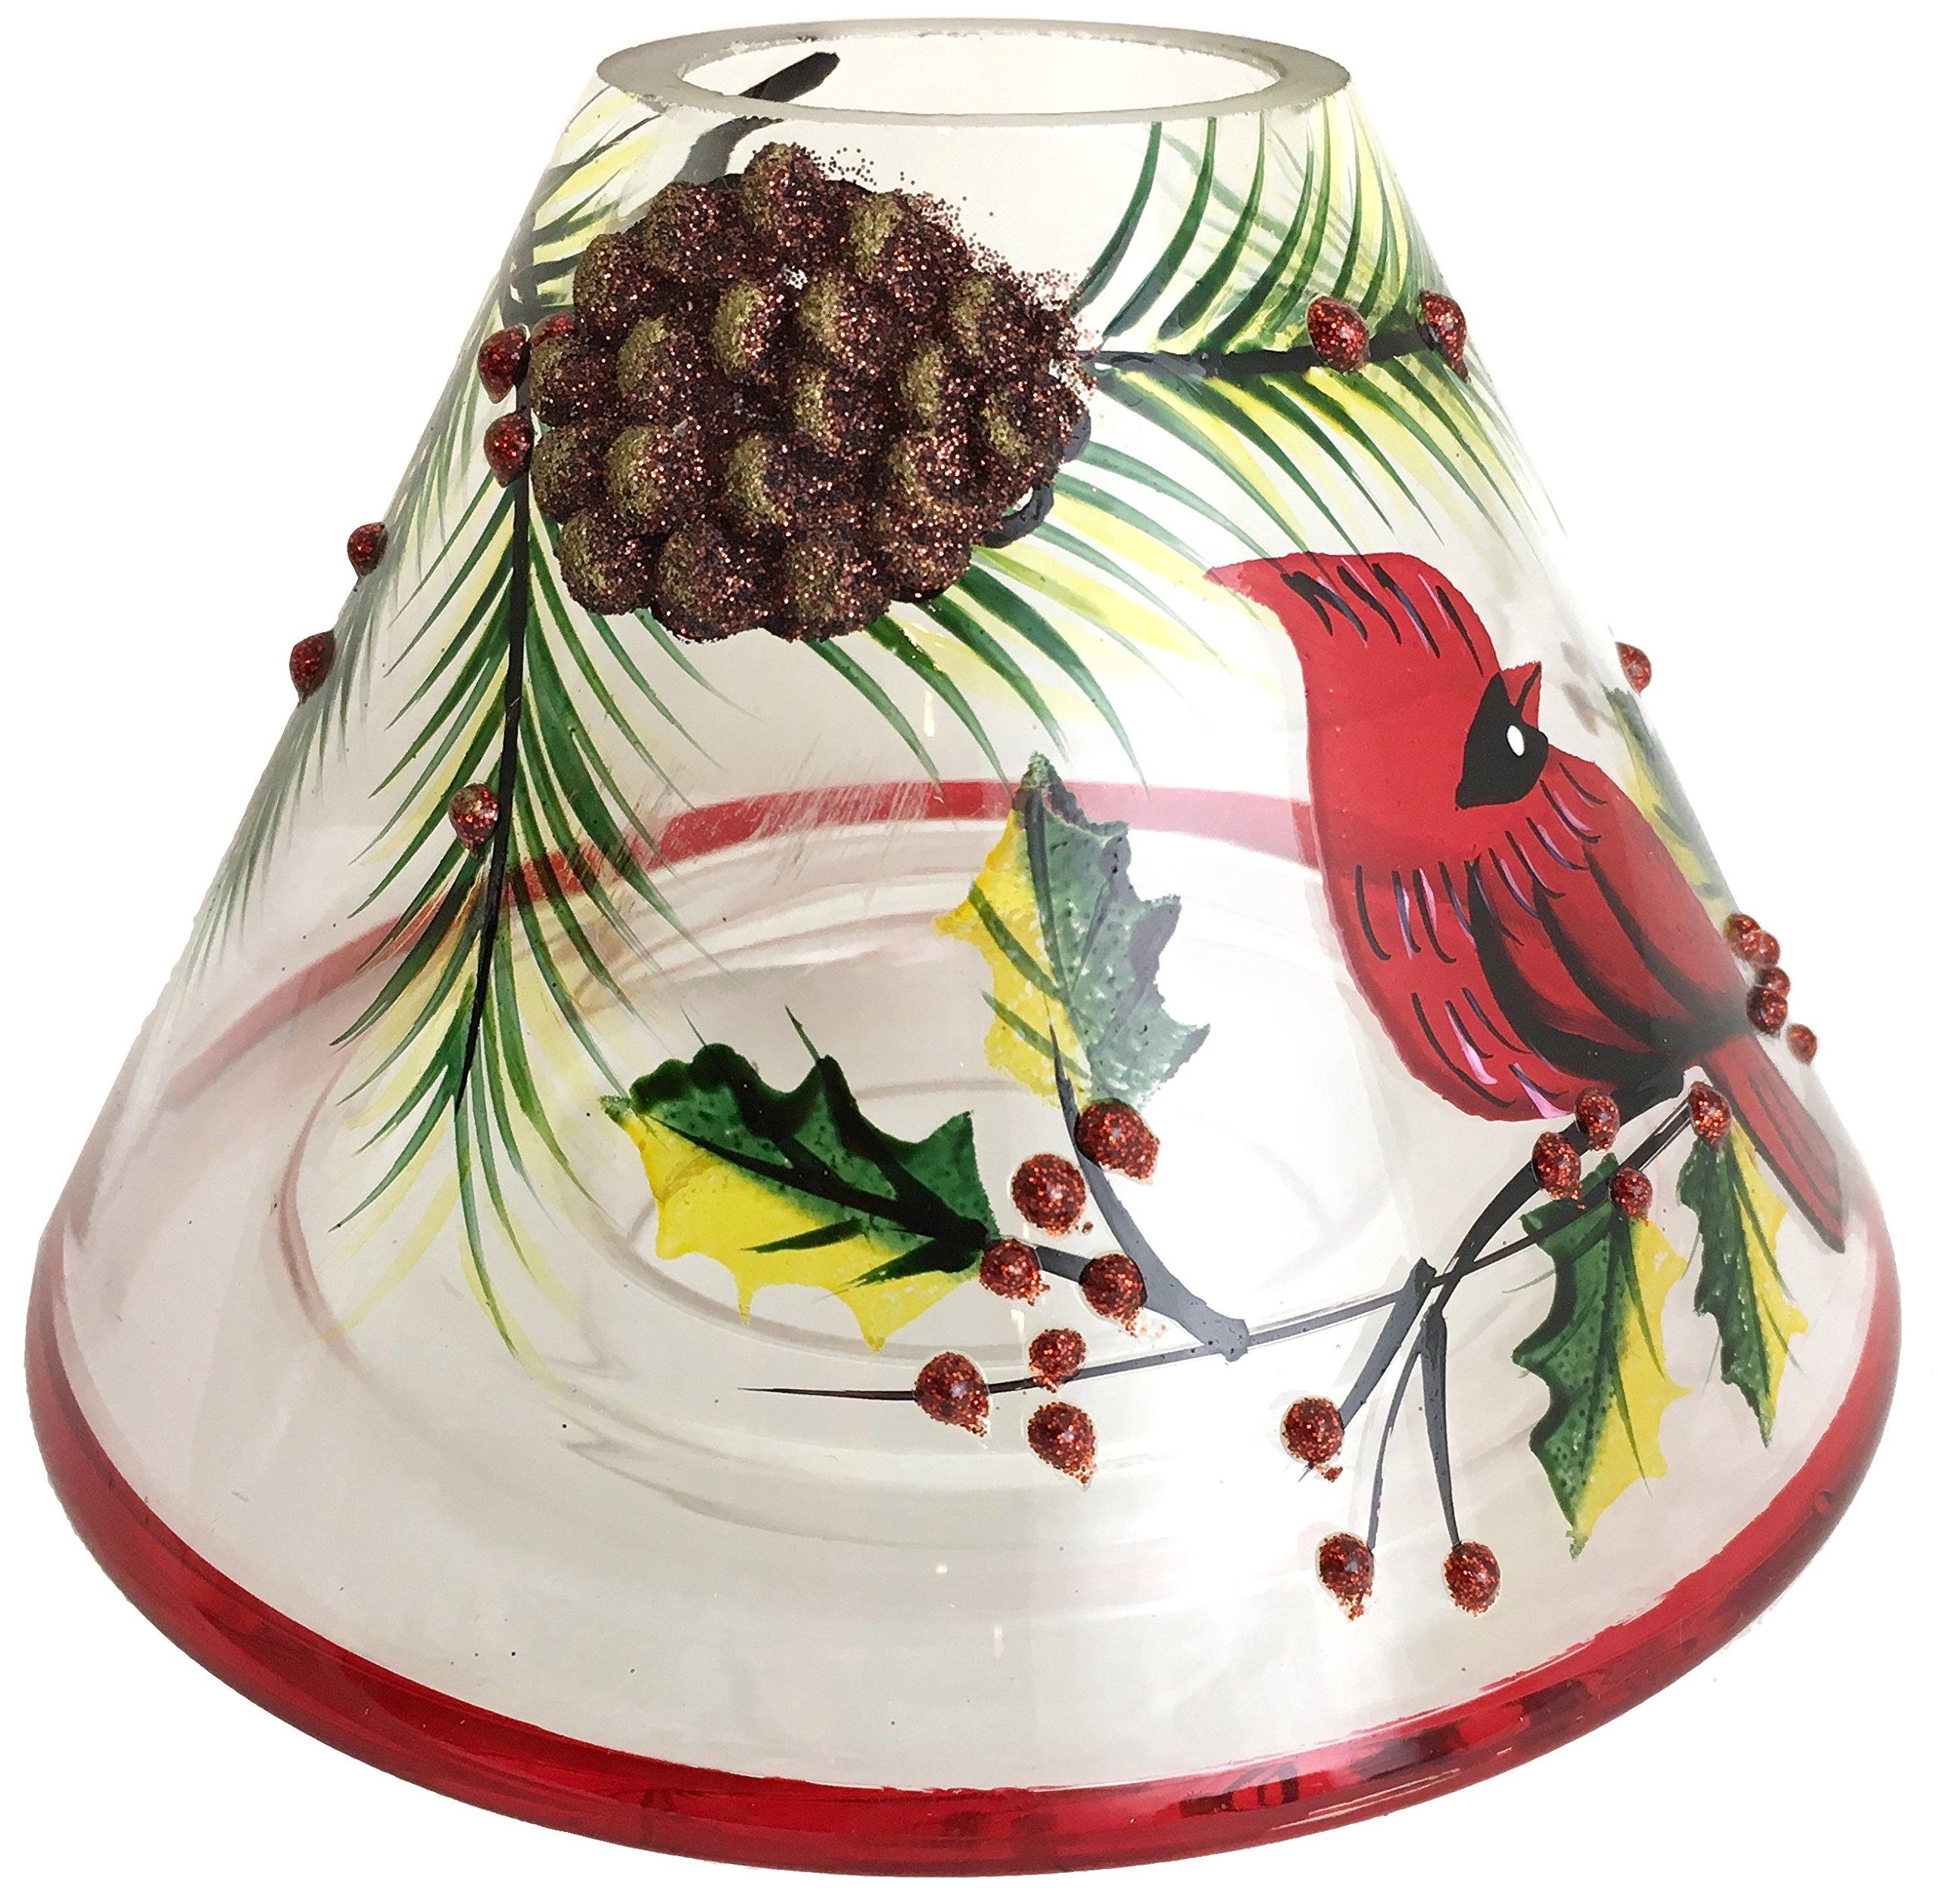 Biedermann & Sons Handpainted Jar Shades, Cardinal Scene, 4-Count by Biedermann & Sons (Image #1)